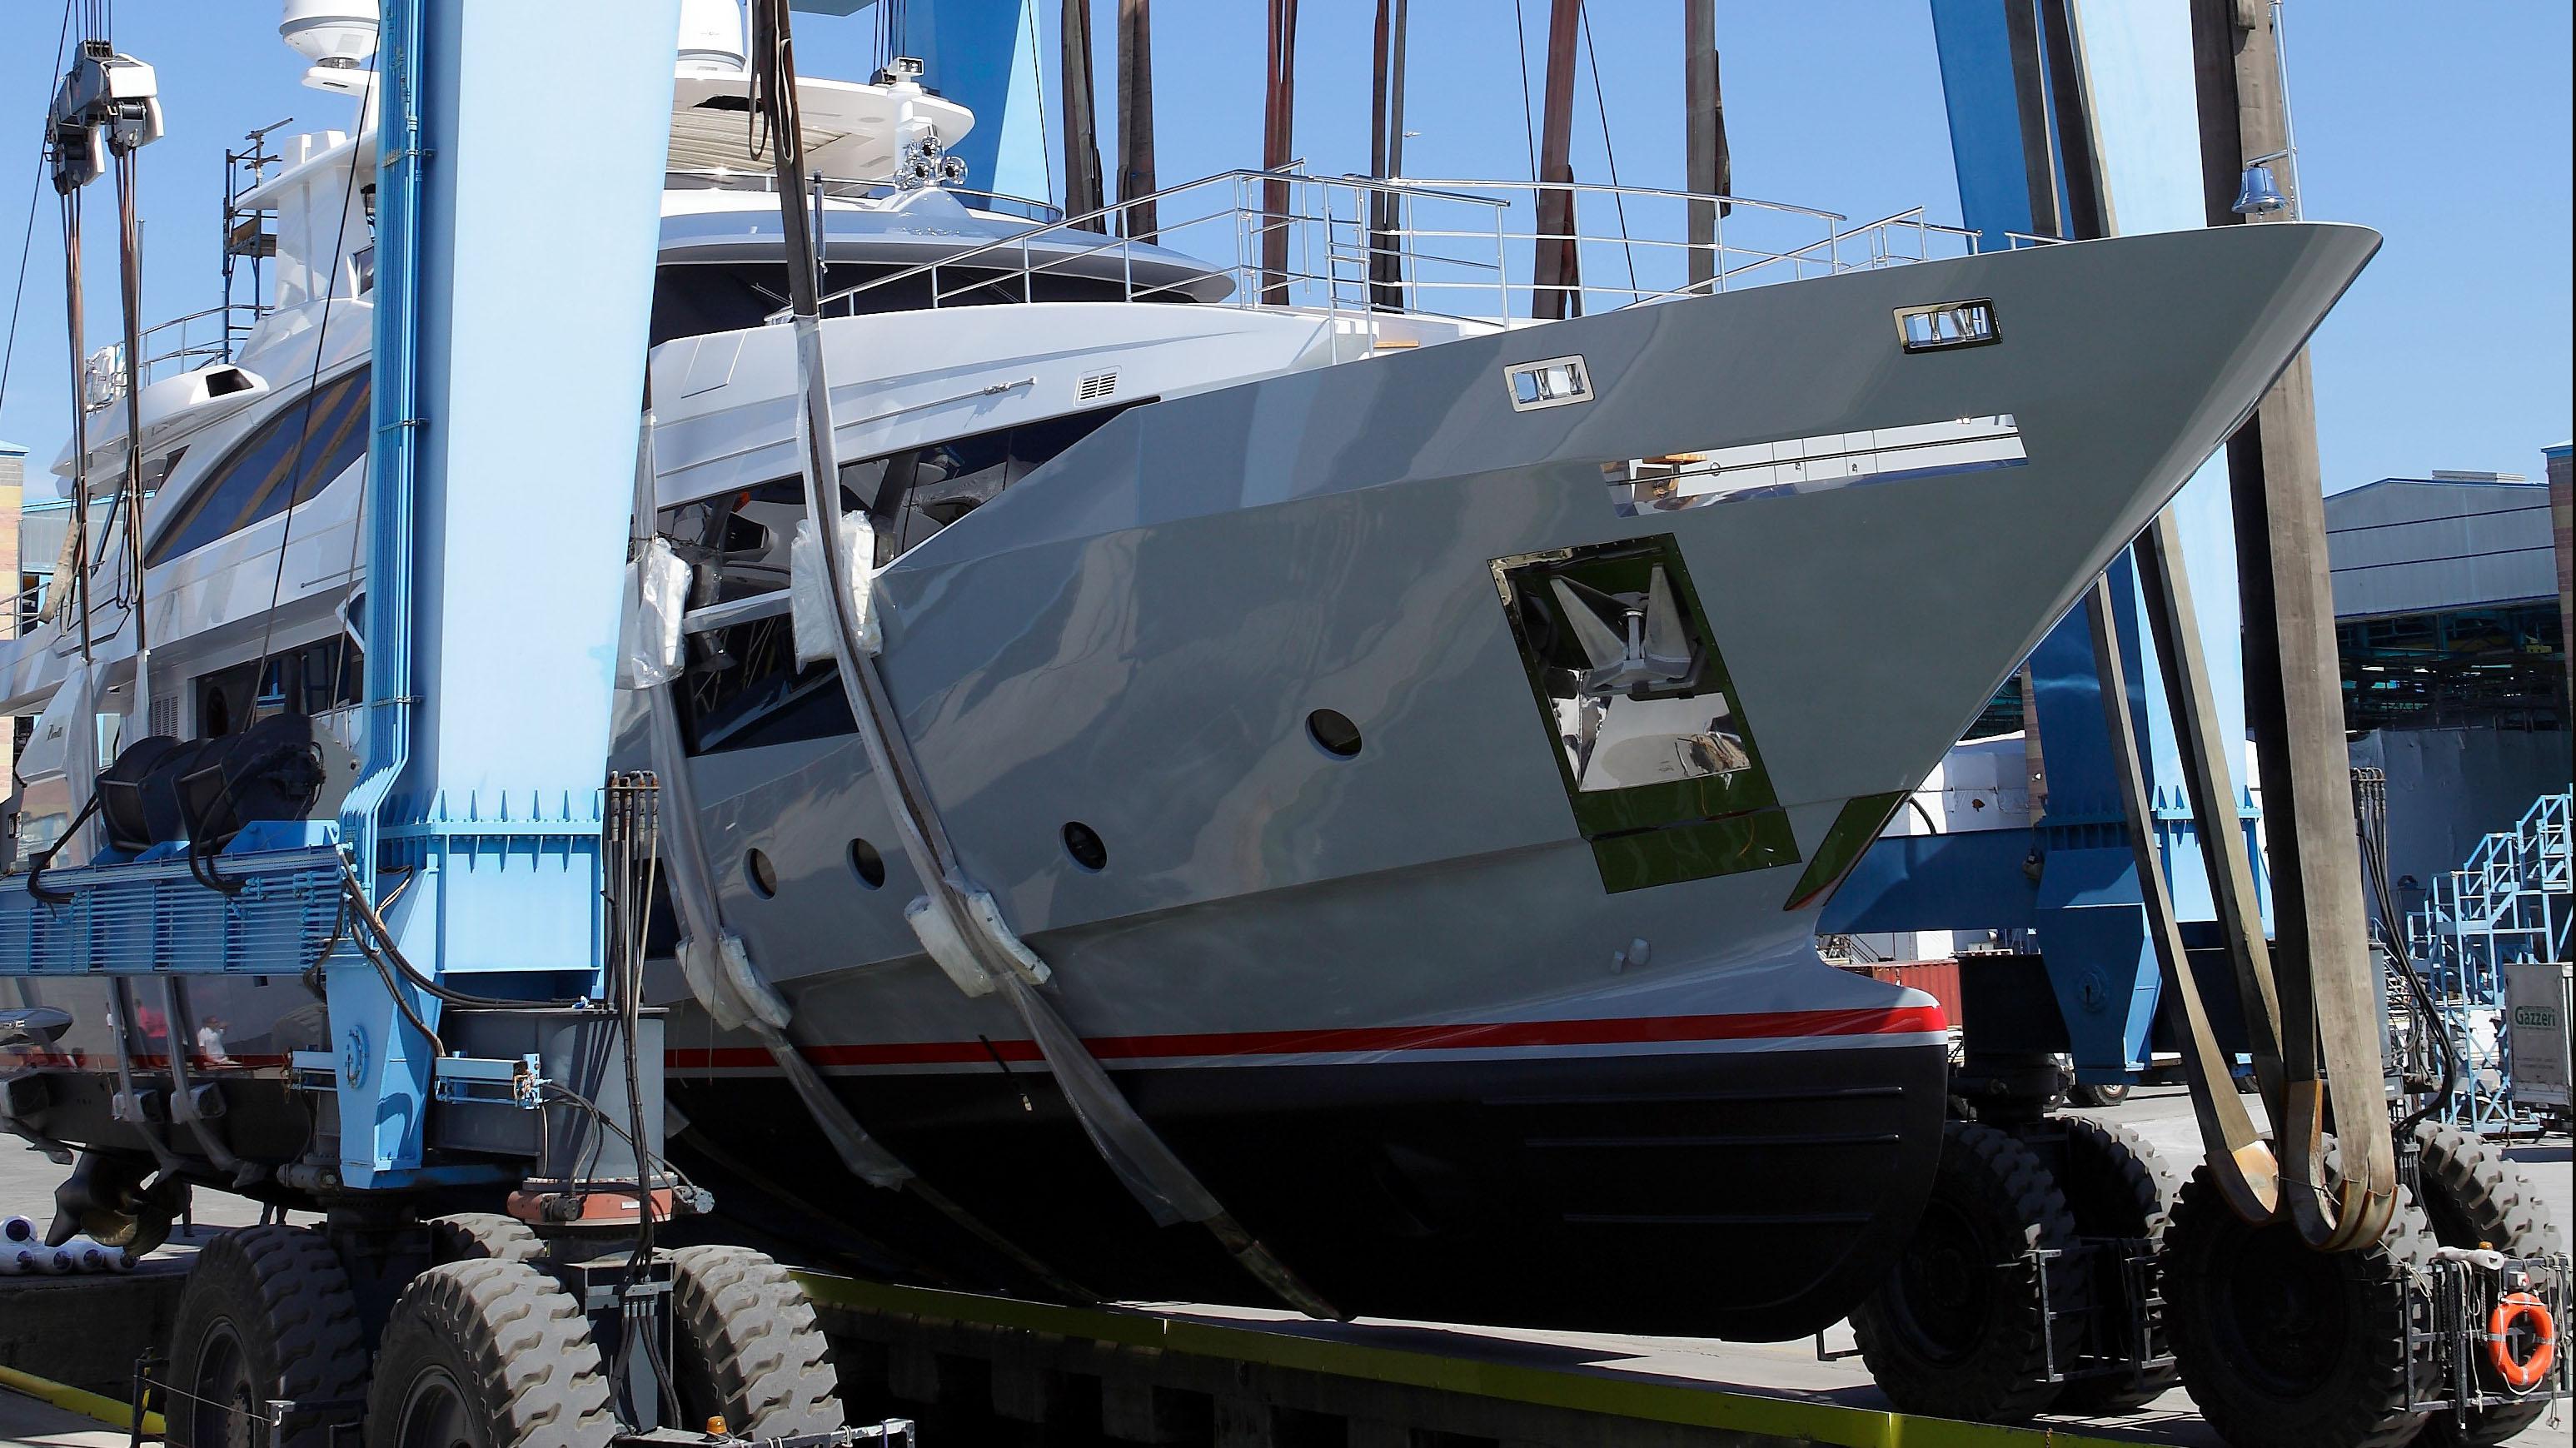 Benetti Fast 125 Lejos 3 Superyacht